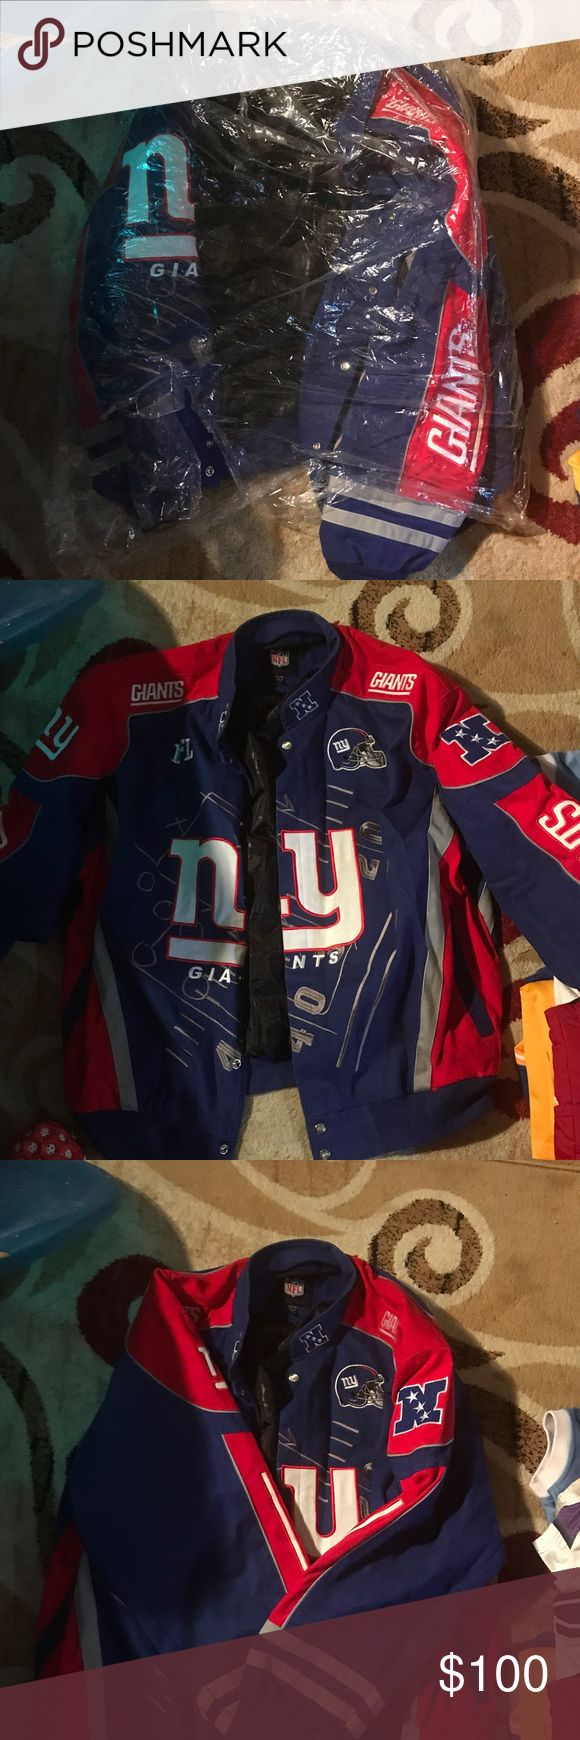 Football jacket Slightly worn, but still in excellent condition NFL Jacket Jackets & Coats Bomber & Varsity